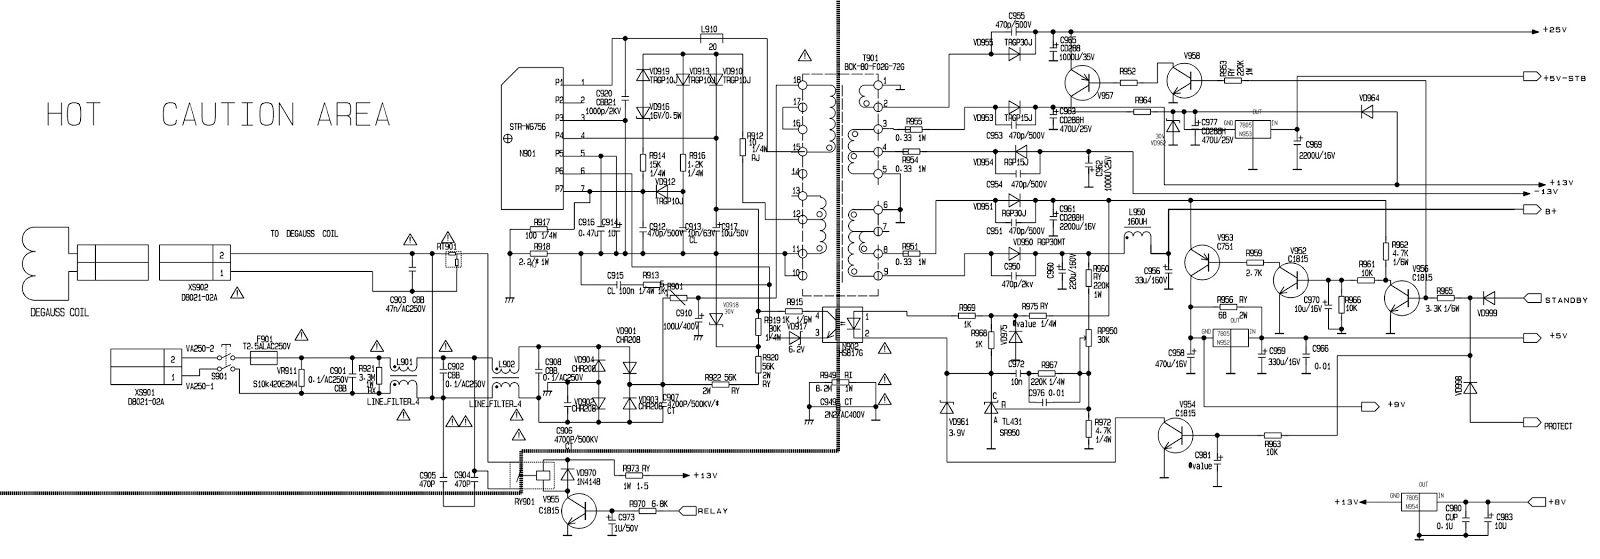 medium resolution of bpl tv circuit diagram download rh mamaambrosia com bpl tv power supply diagram bpl tv power supply diagram